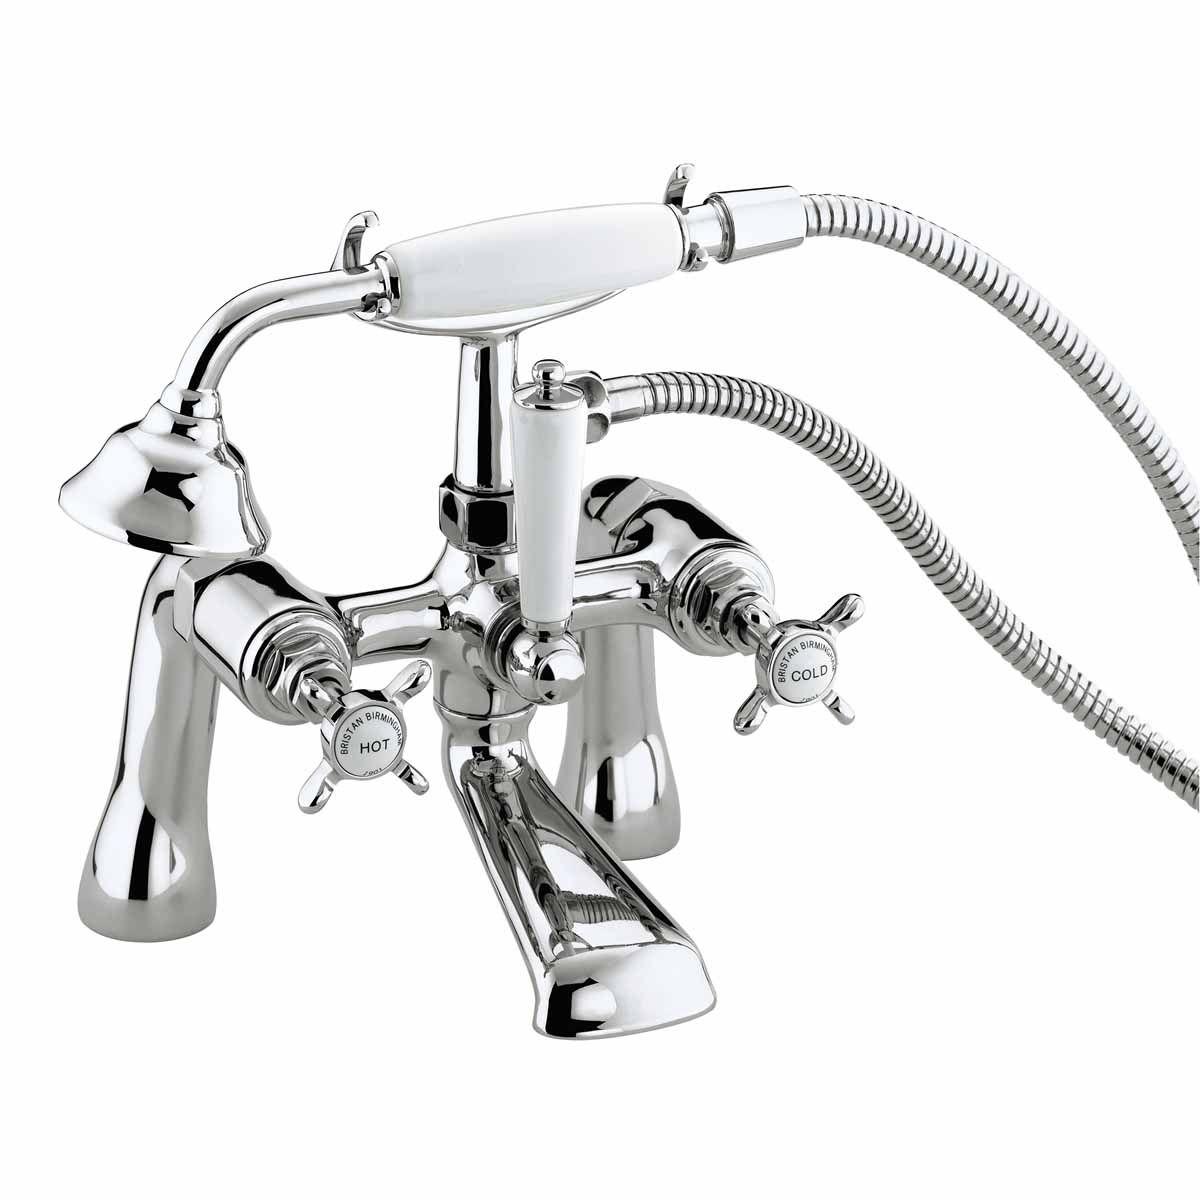 Bristan 1901 Pillar Bath Shower Mixer Tap N BSM C CD | Bath shower ...